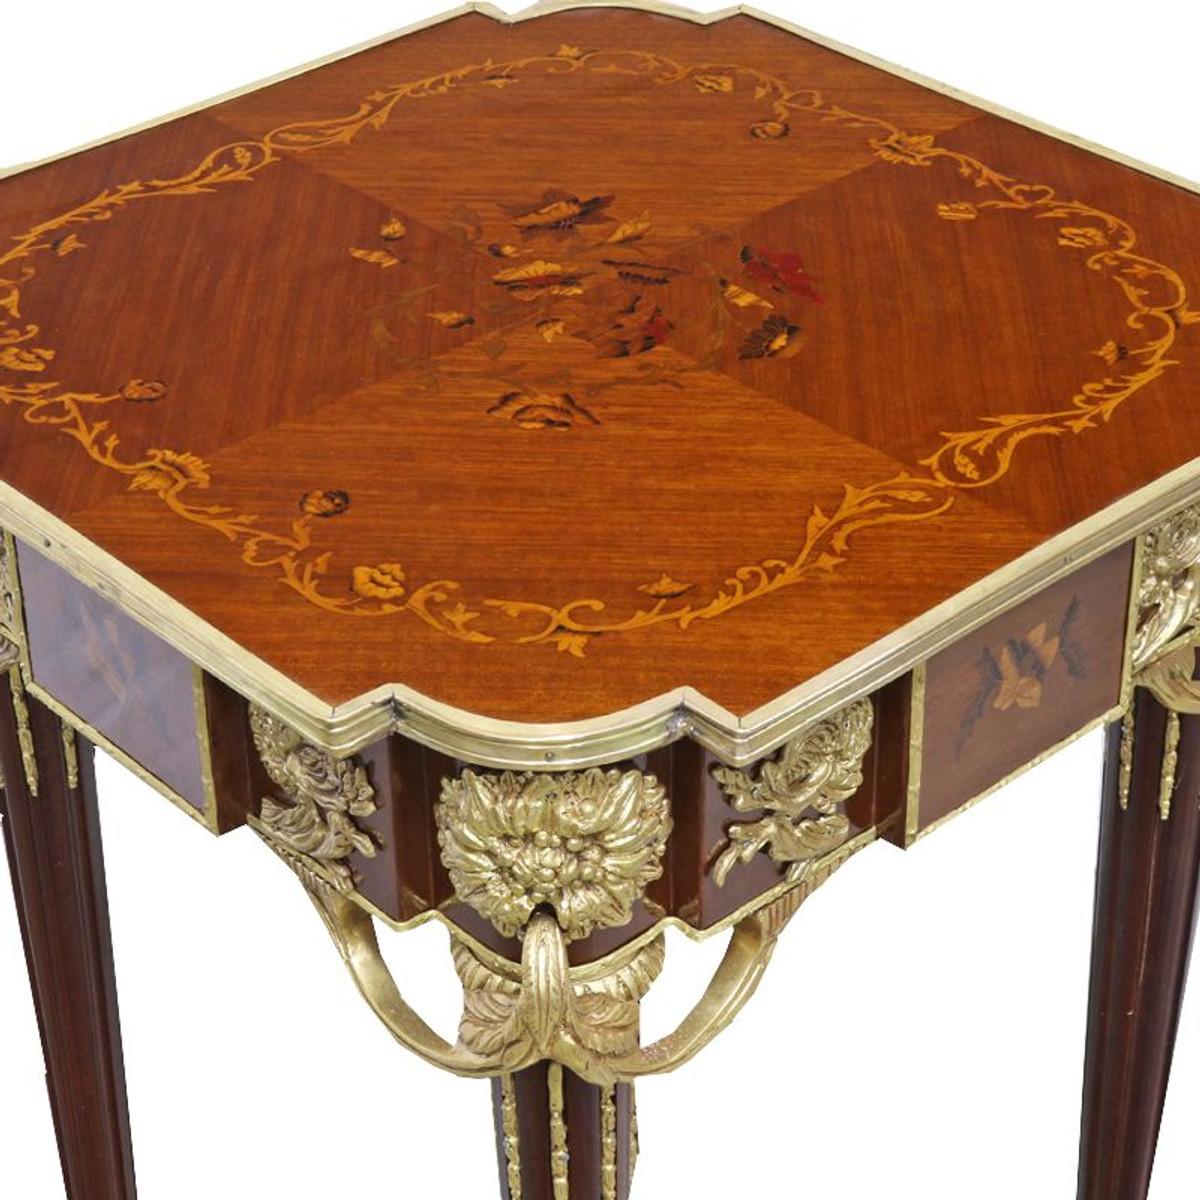 Casa Padrino Barock Beistelltisch Mahagoni Intarsien / Gold H75 x 50 cm - Ludwig XVI Antik Stil Tisch - Möbel 3